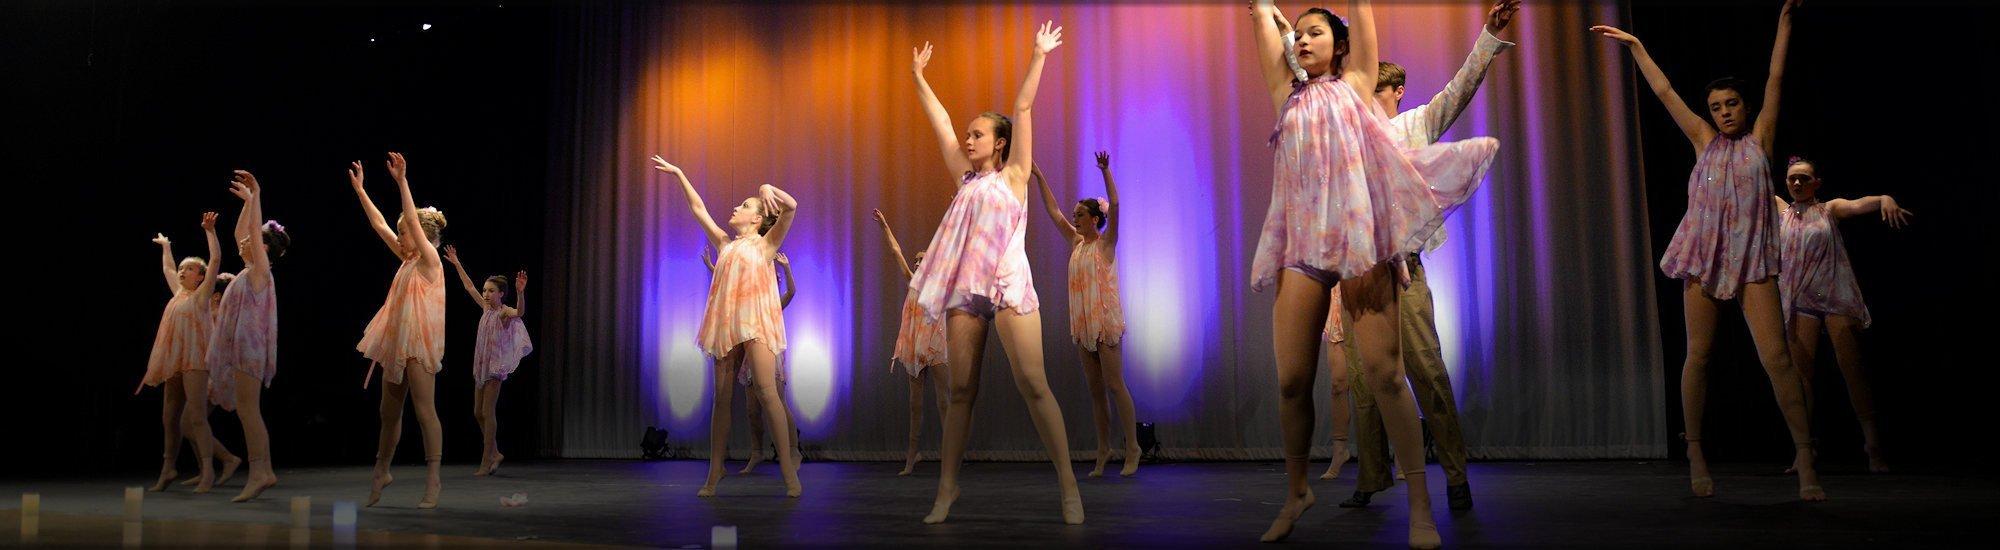 dance classes Tolland, CT